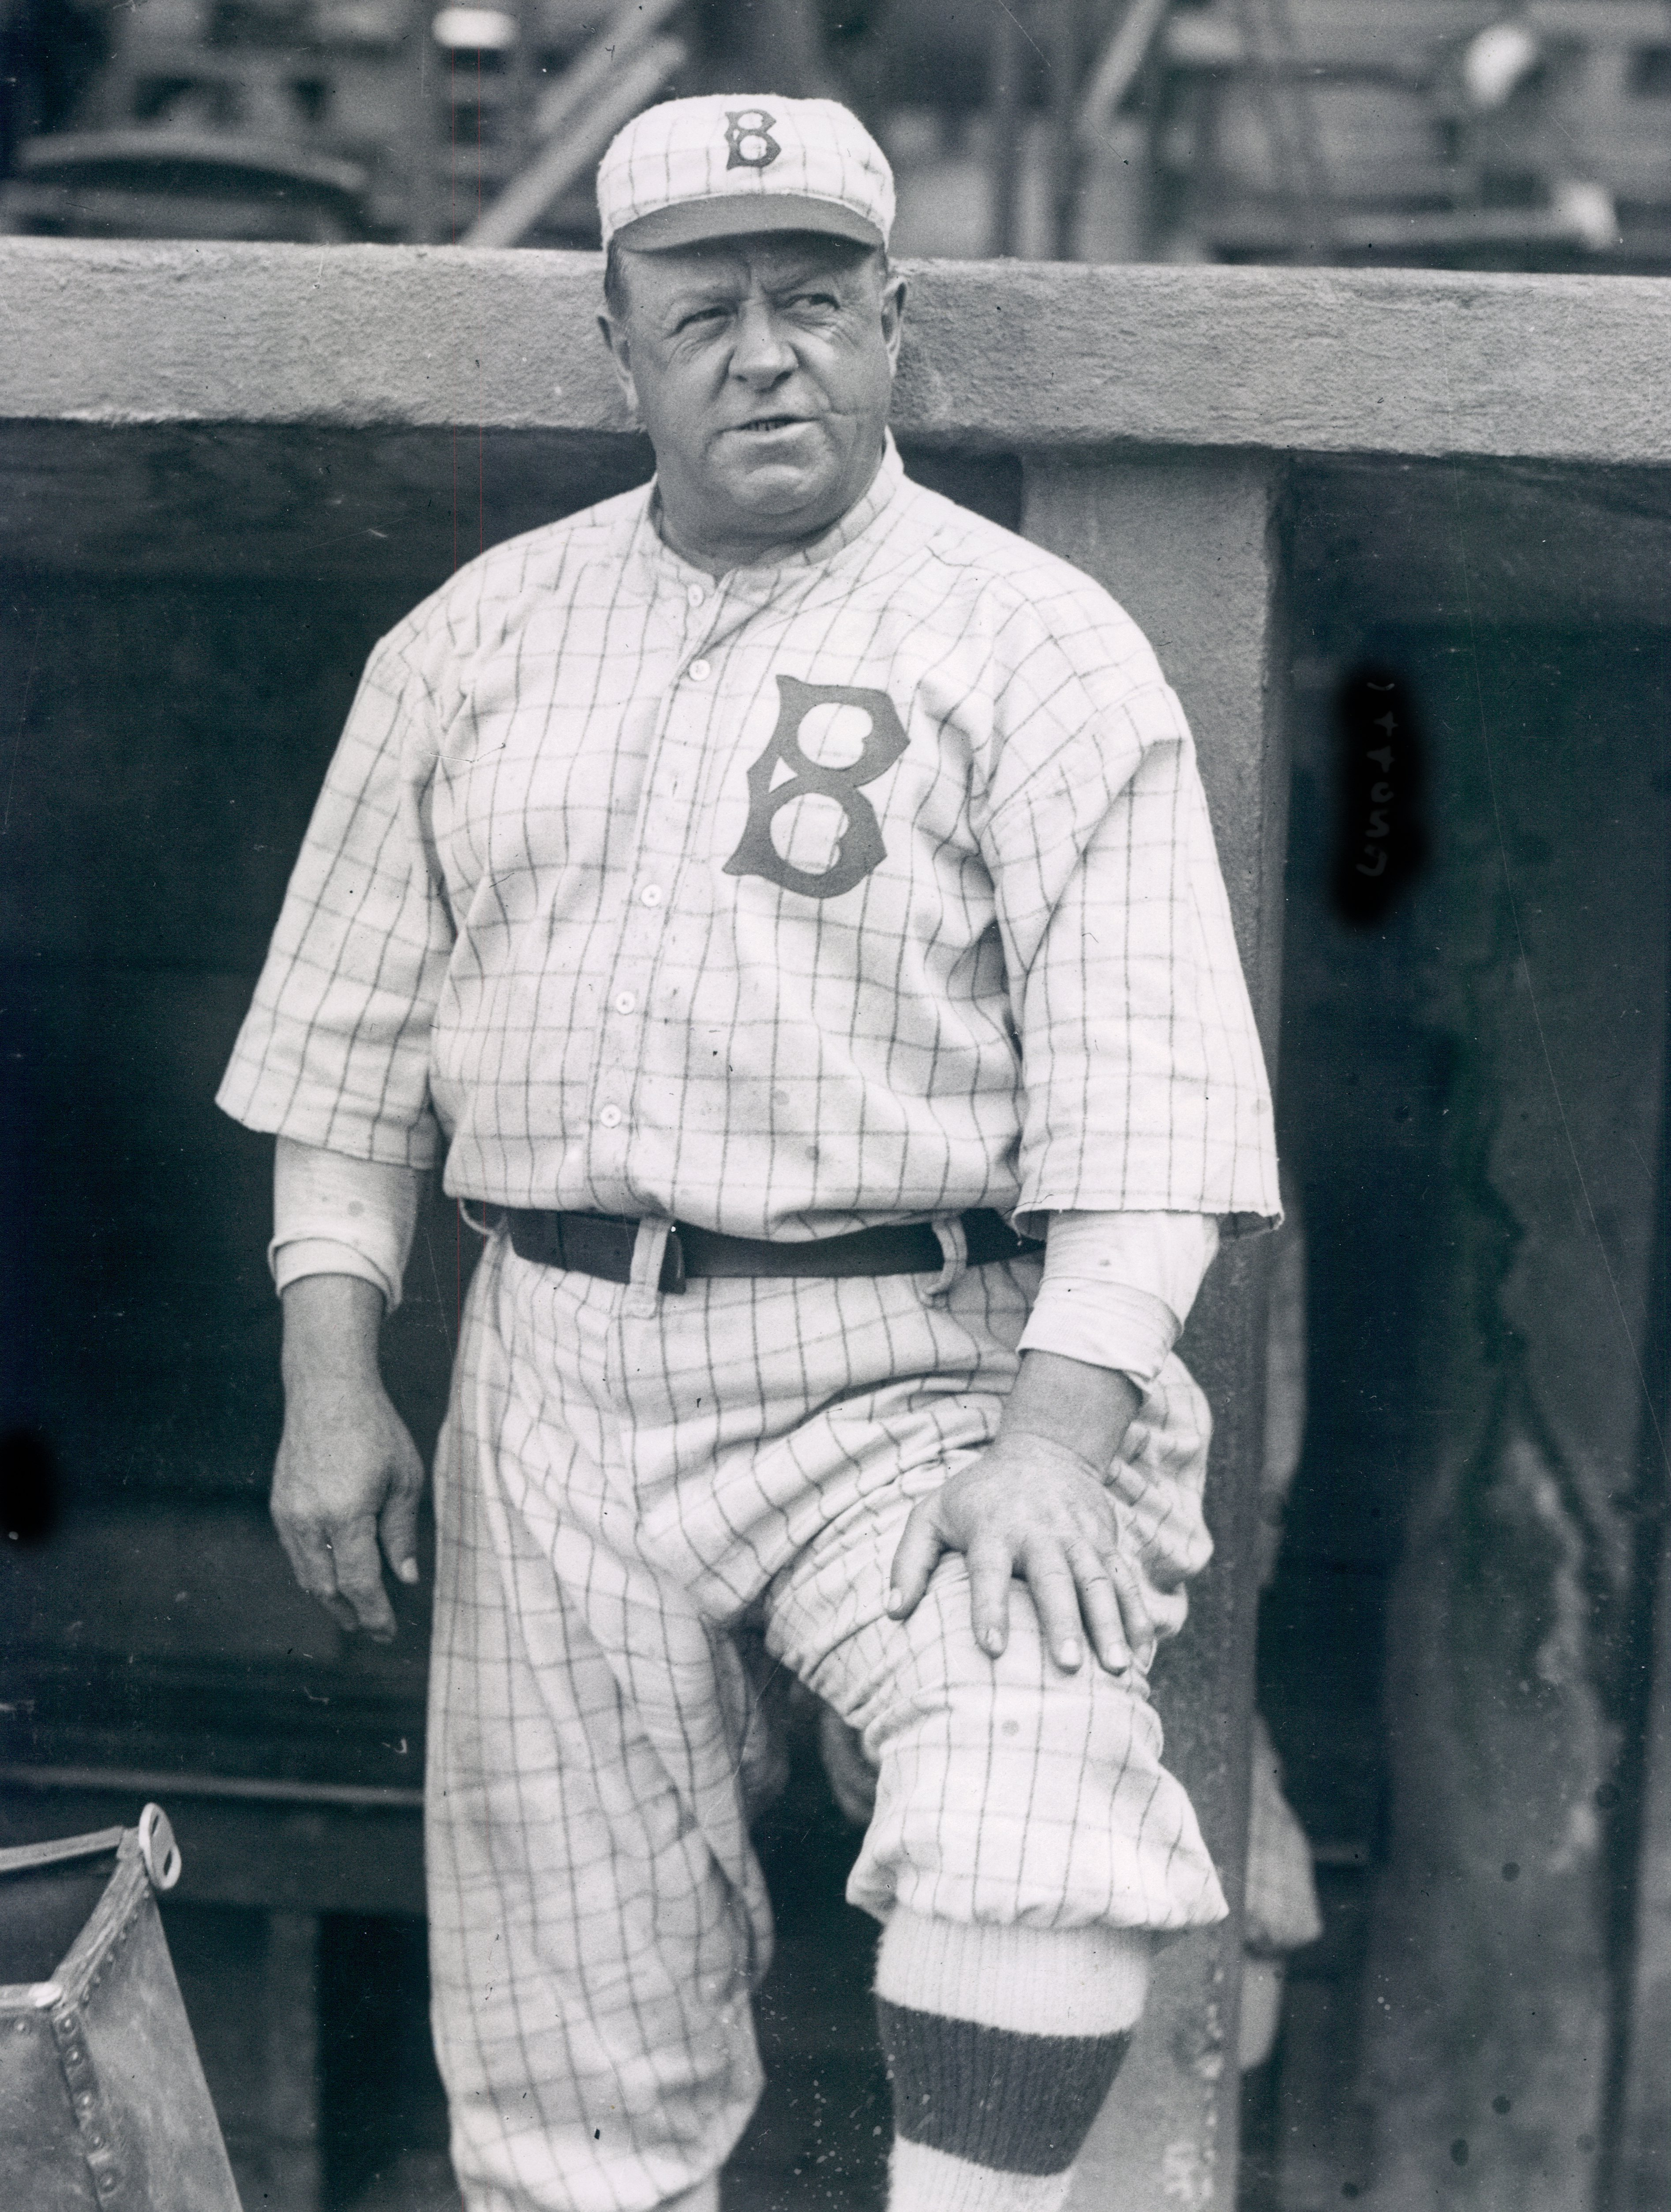 Brooklyn Dodgers...